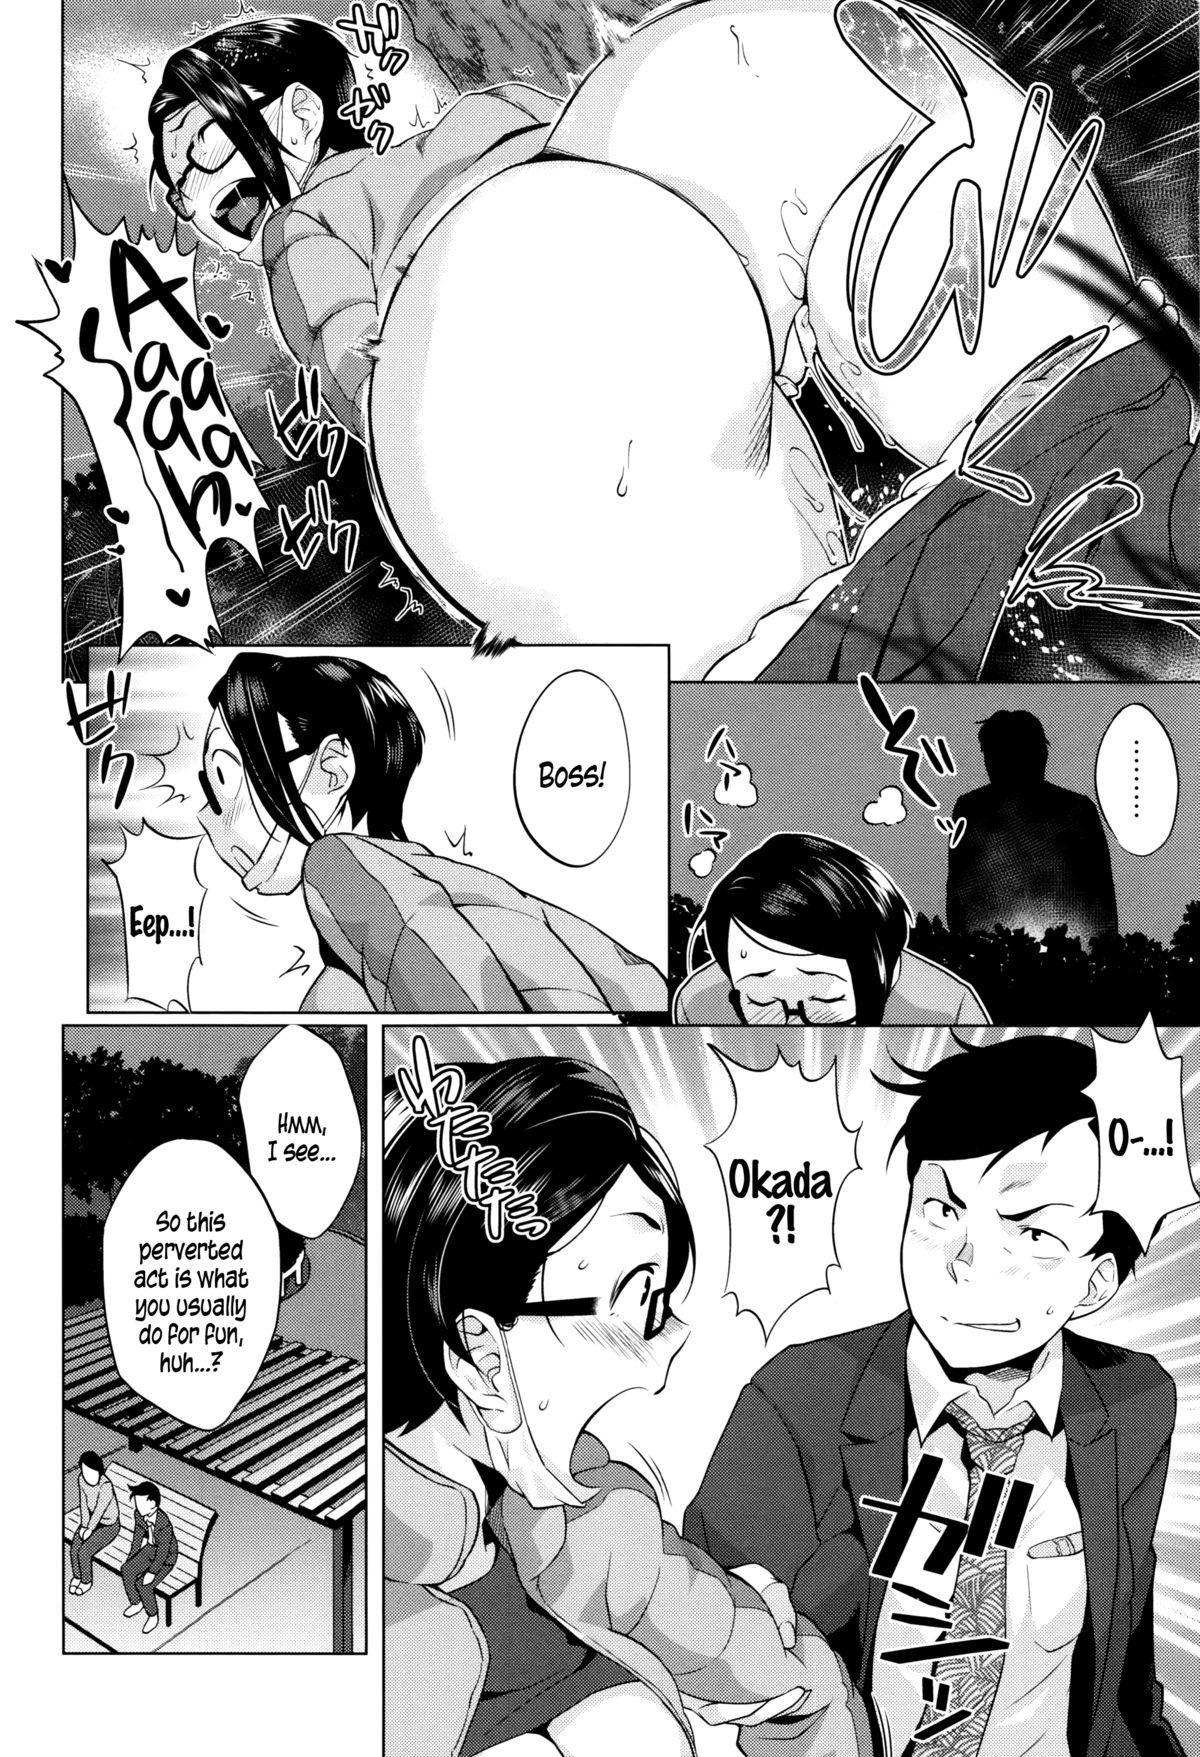 Hatsujou! Namaiki JK | Horny! Cheeky JK 194